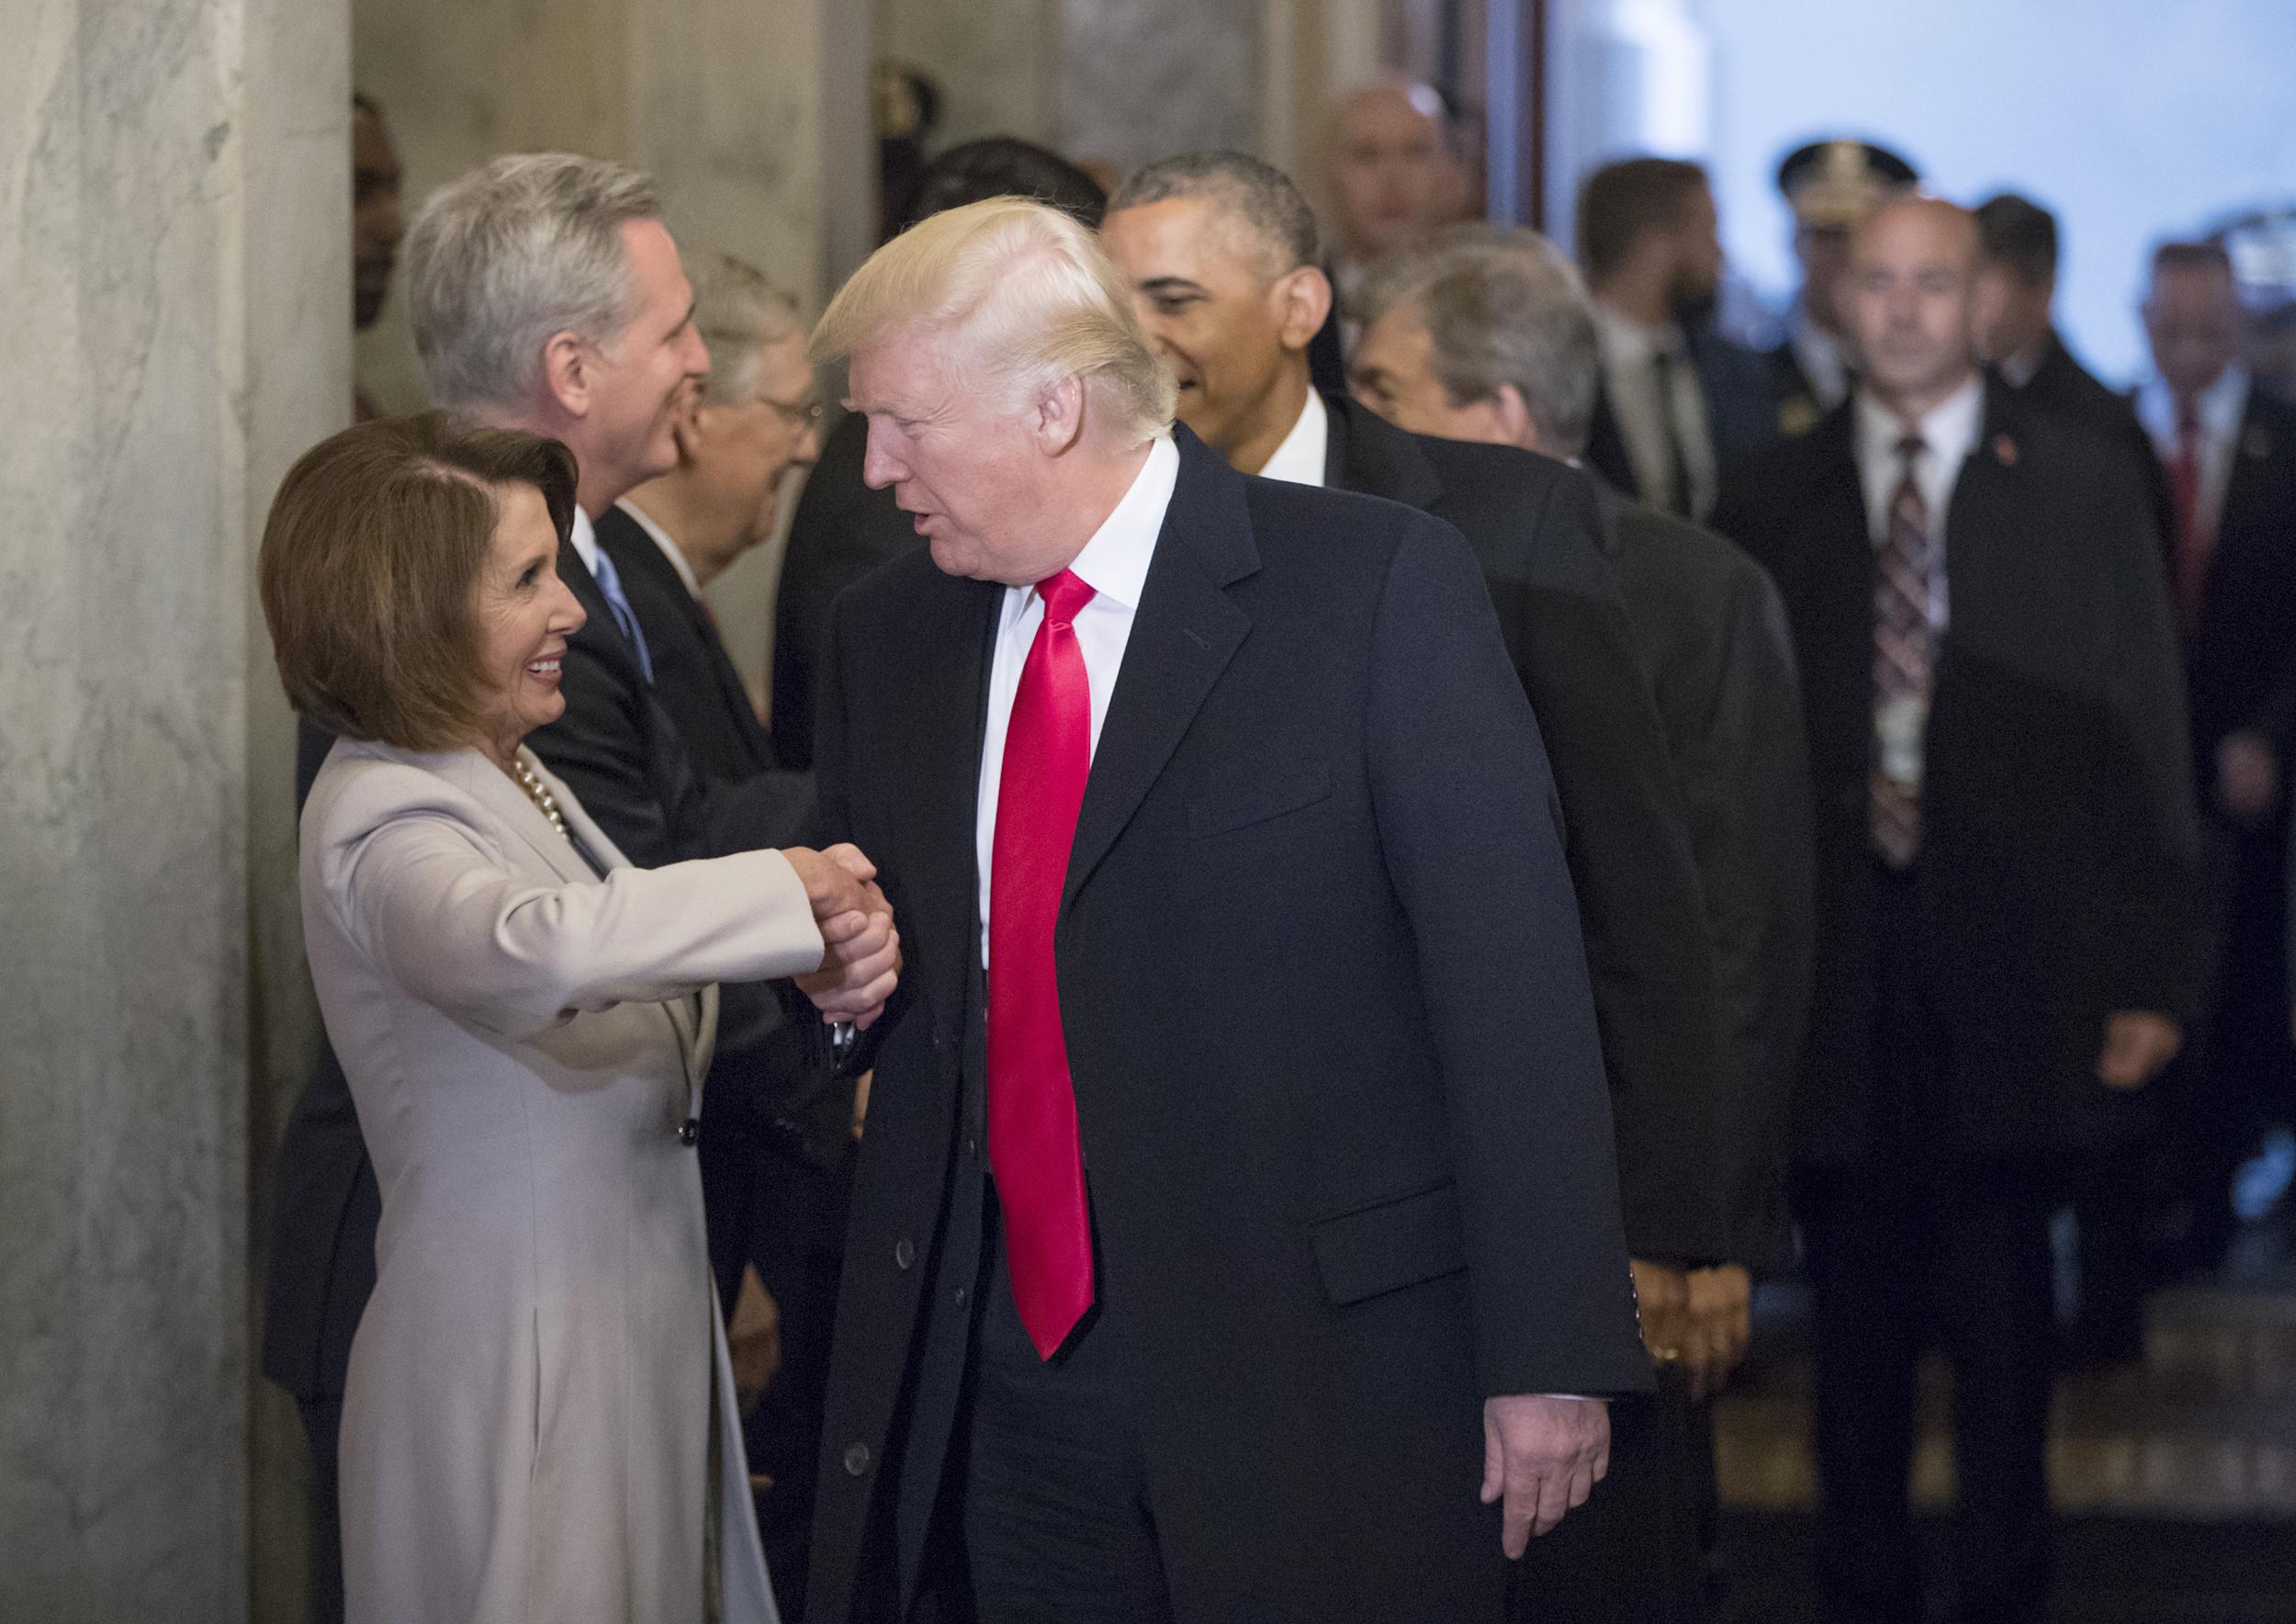 Image: President-elect Donald Trump greets House Minority Leader Nancy Pelosi